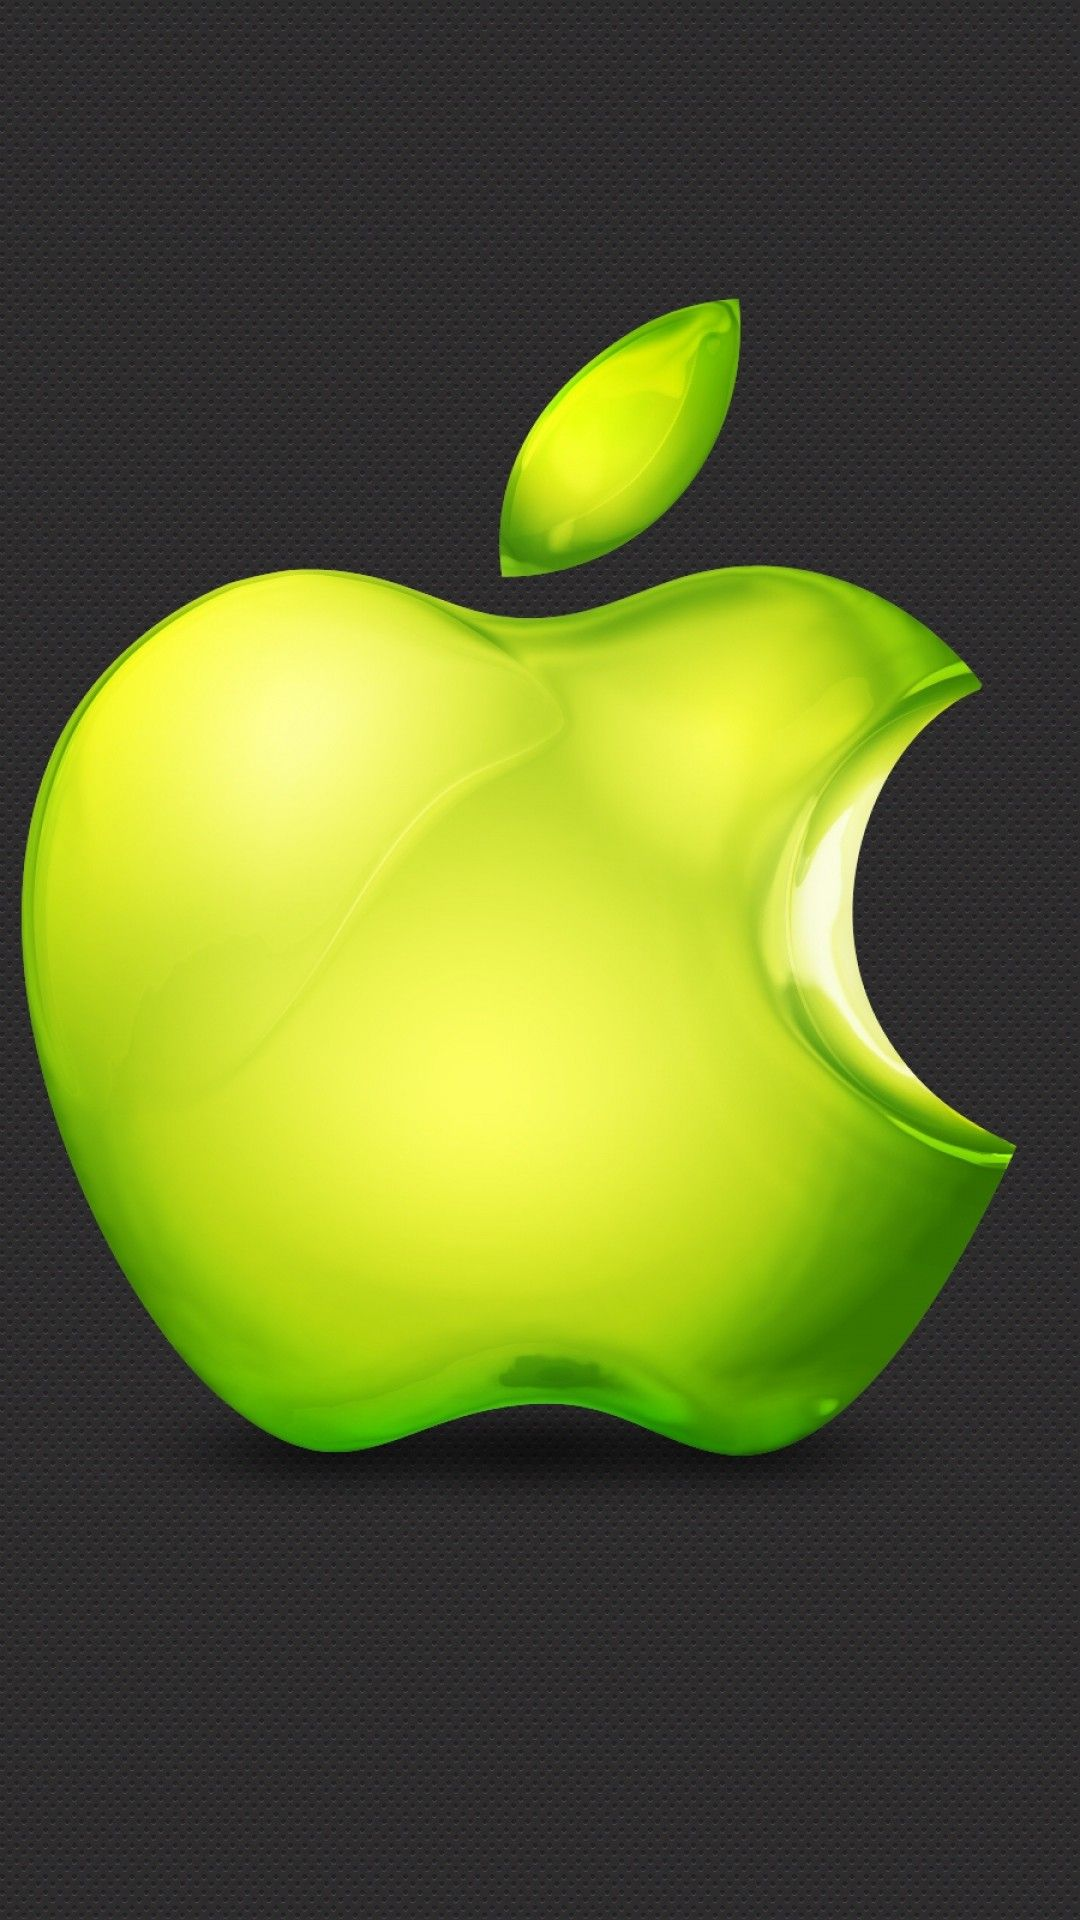 View source image Apple logo wallpaper, Apple wallpaper